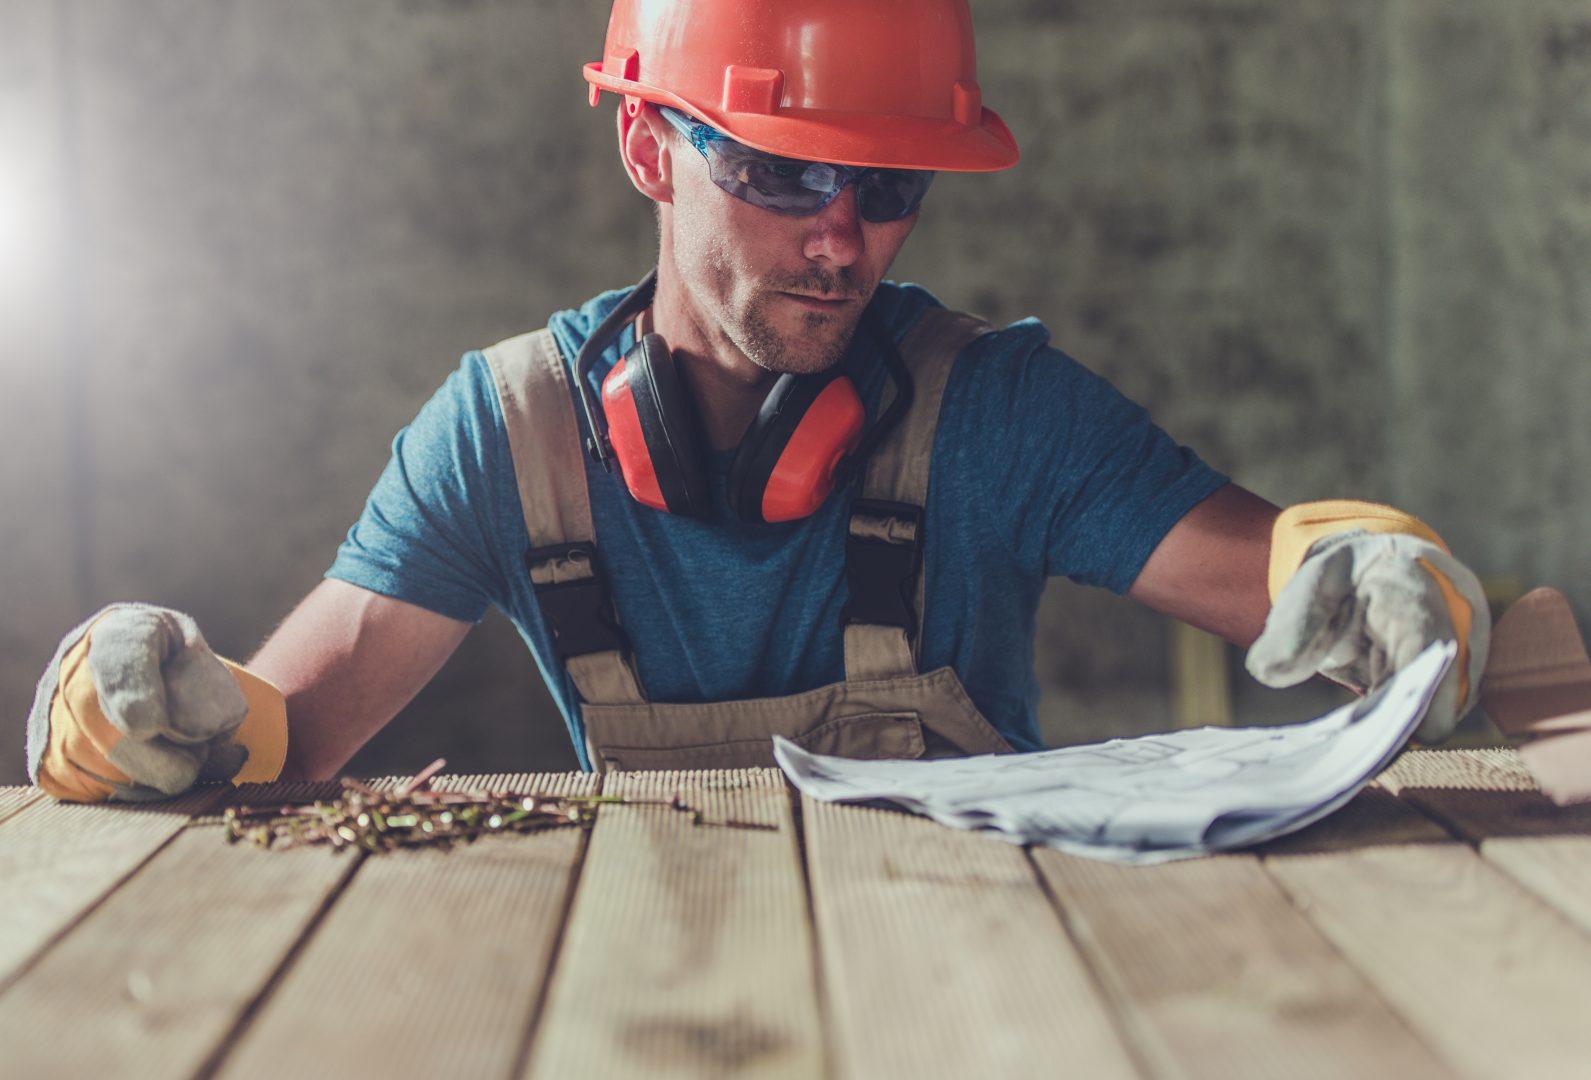 contractor-with-documentation-PYFB9BU